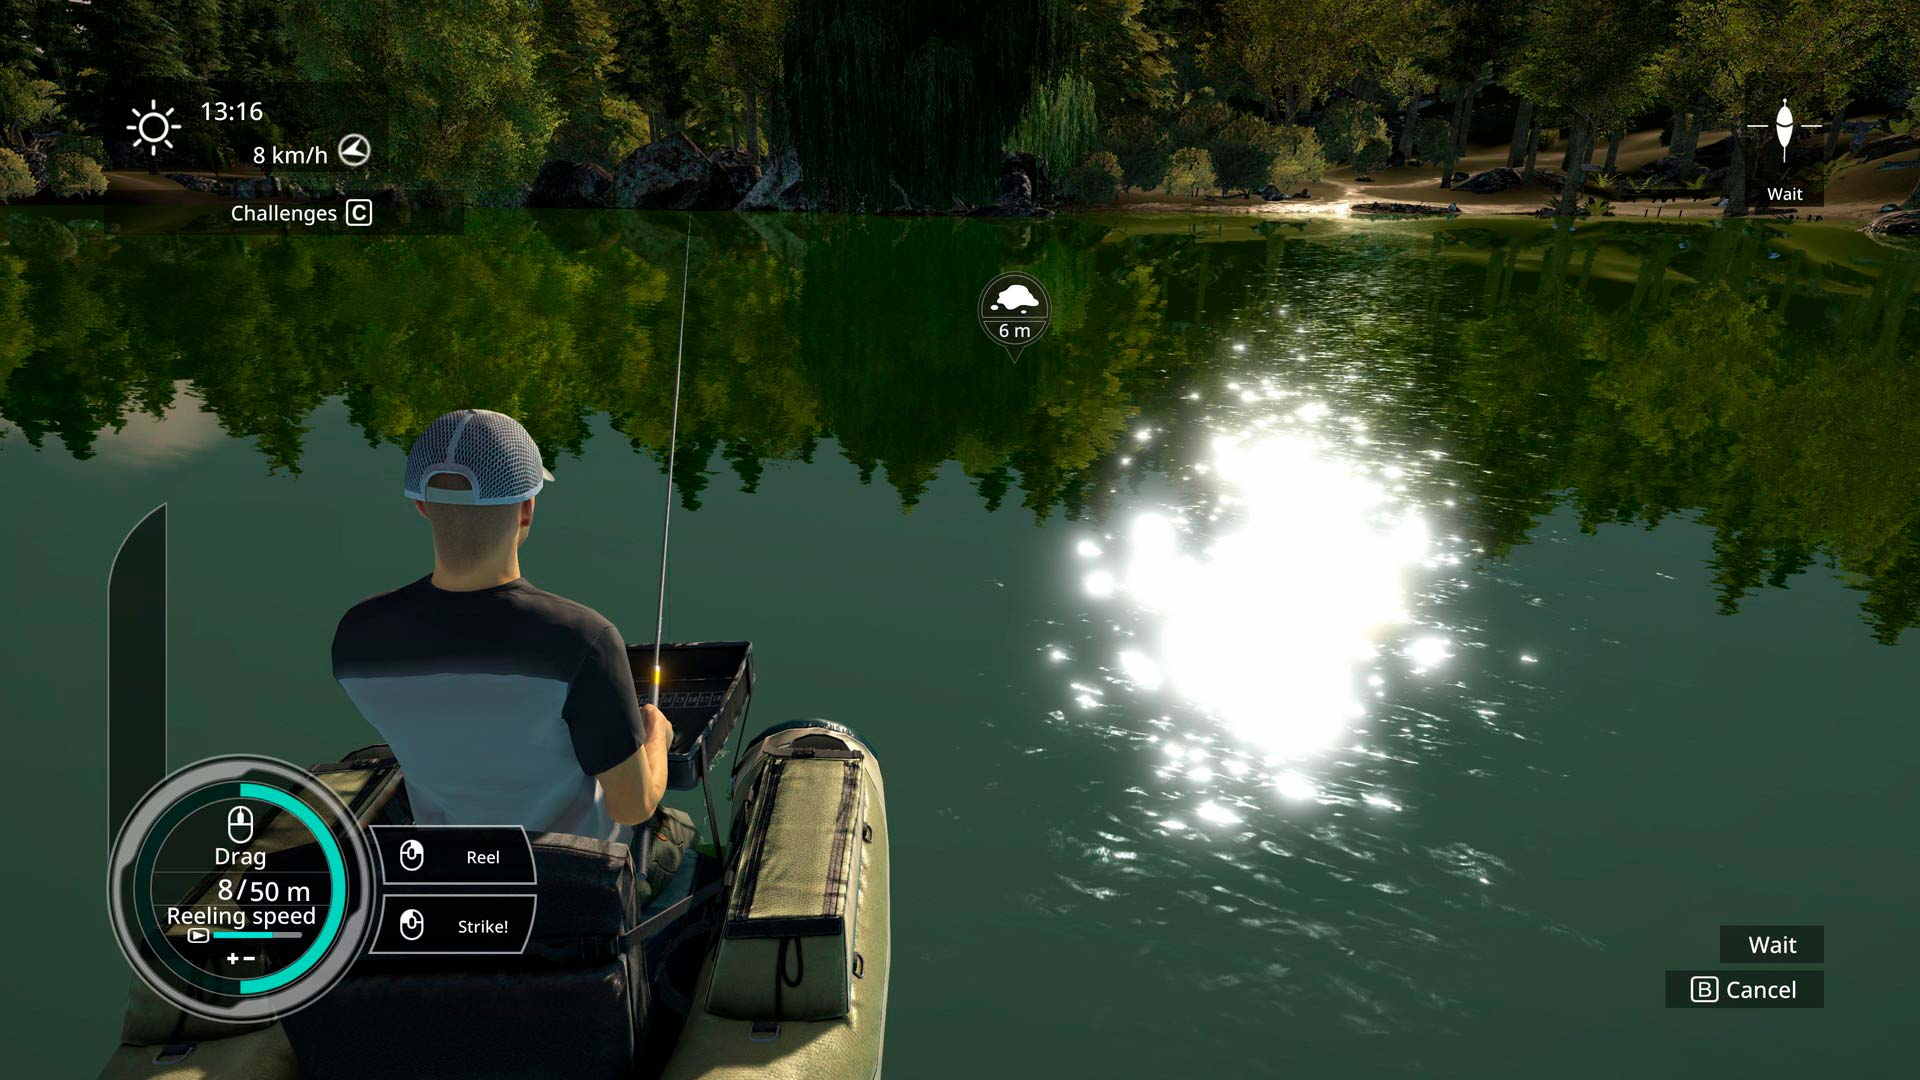 Библиотека рыбака. Книги и журналы о рыбалке